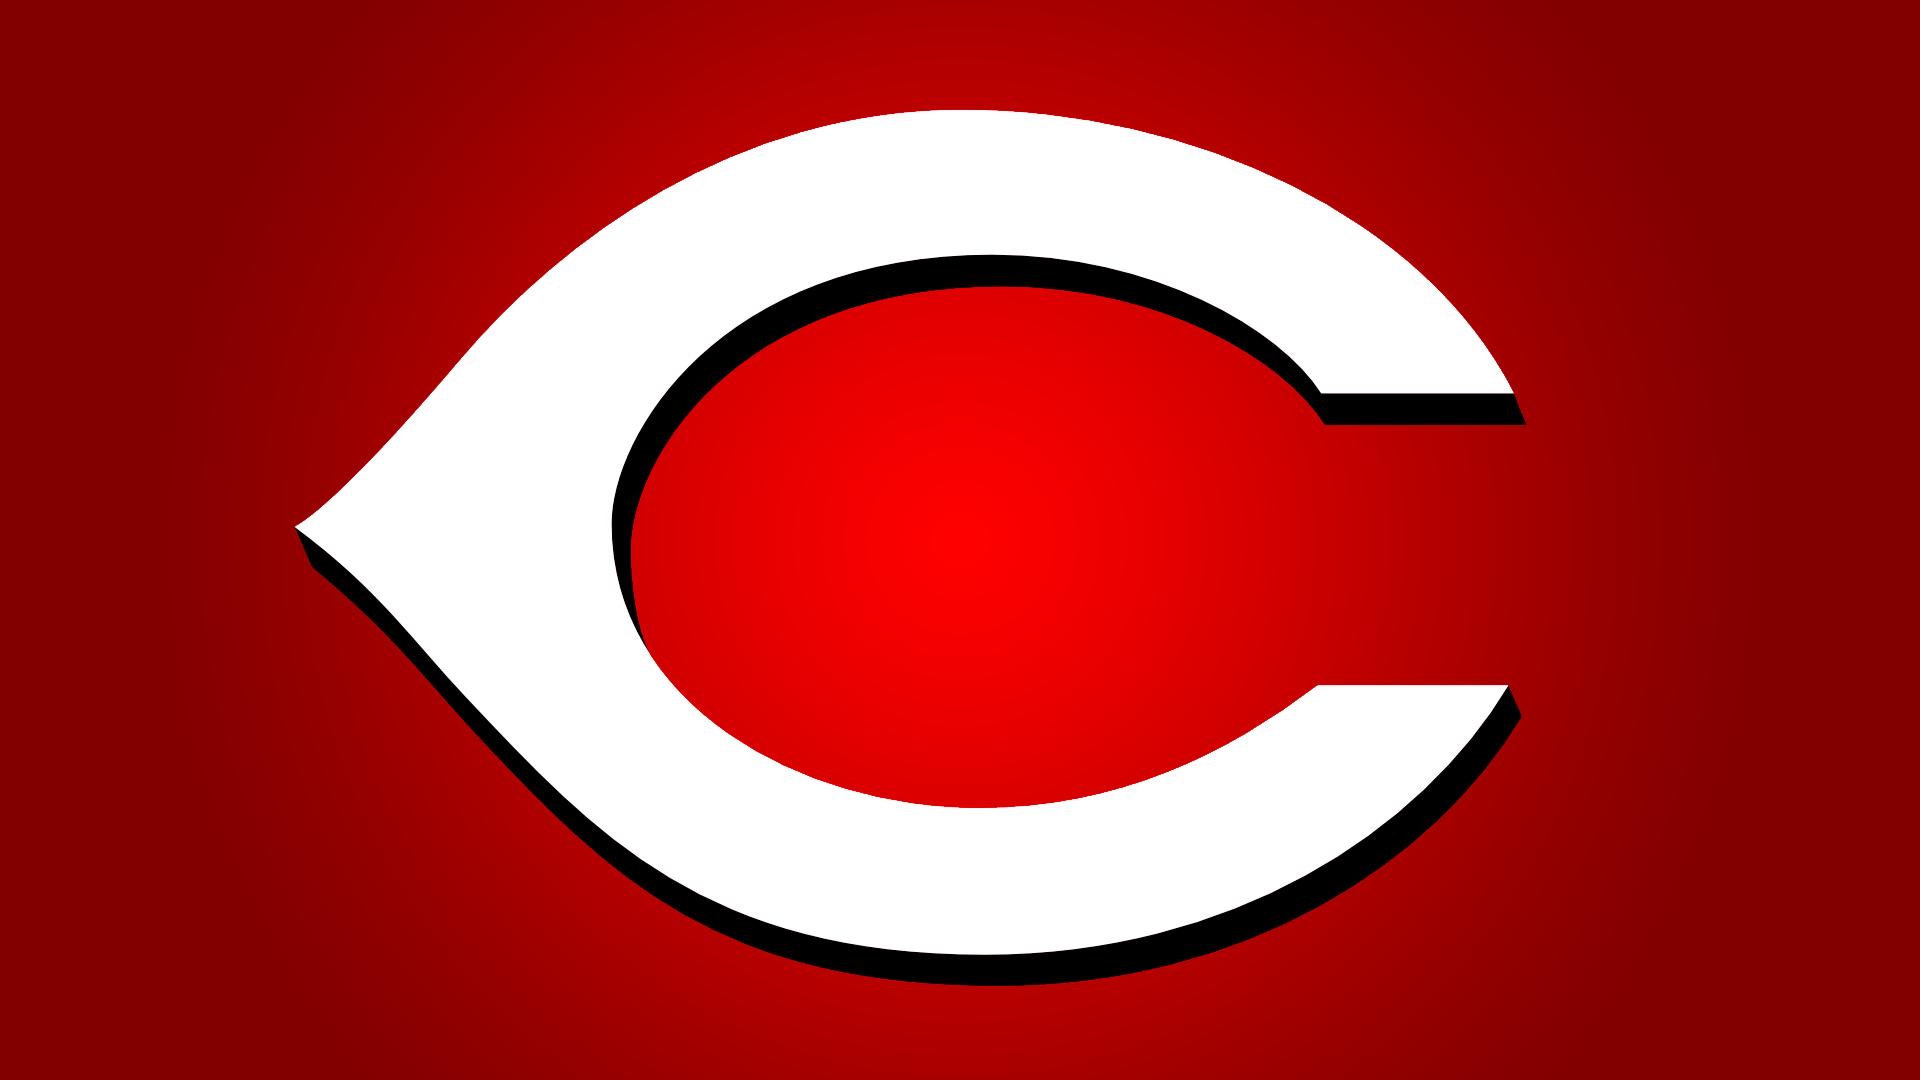 Cincinnati Reds Wallpaper 17864 1365x1024px 1920x1080